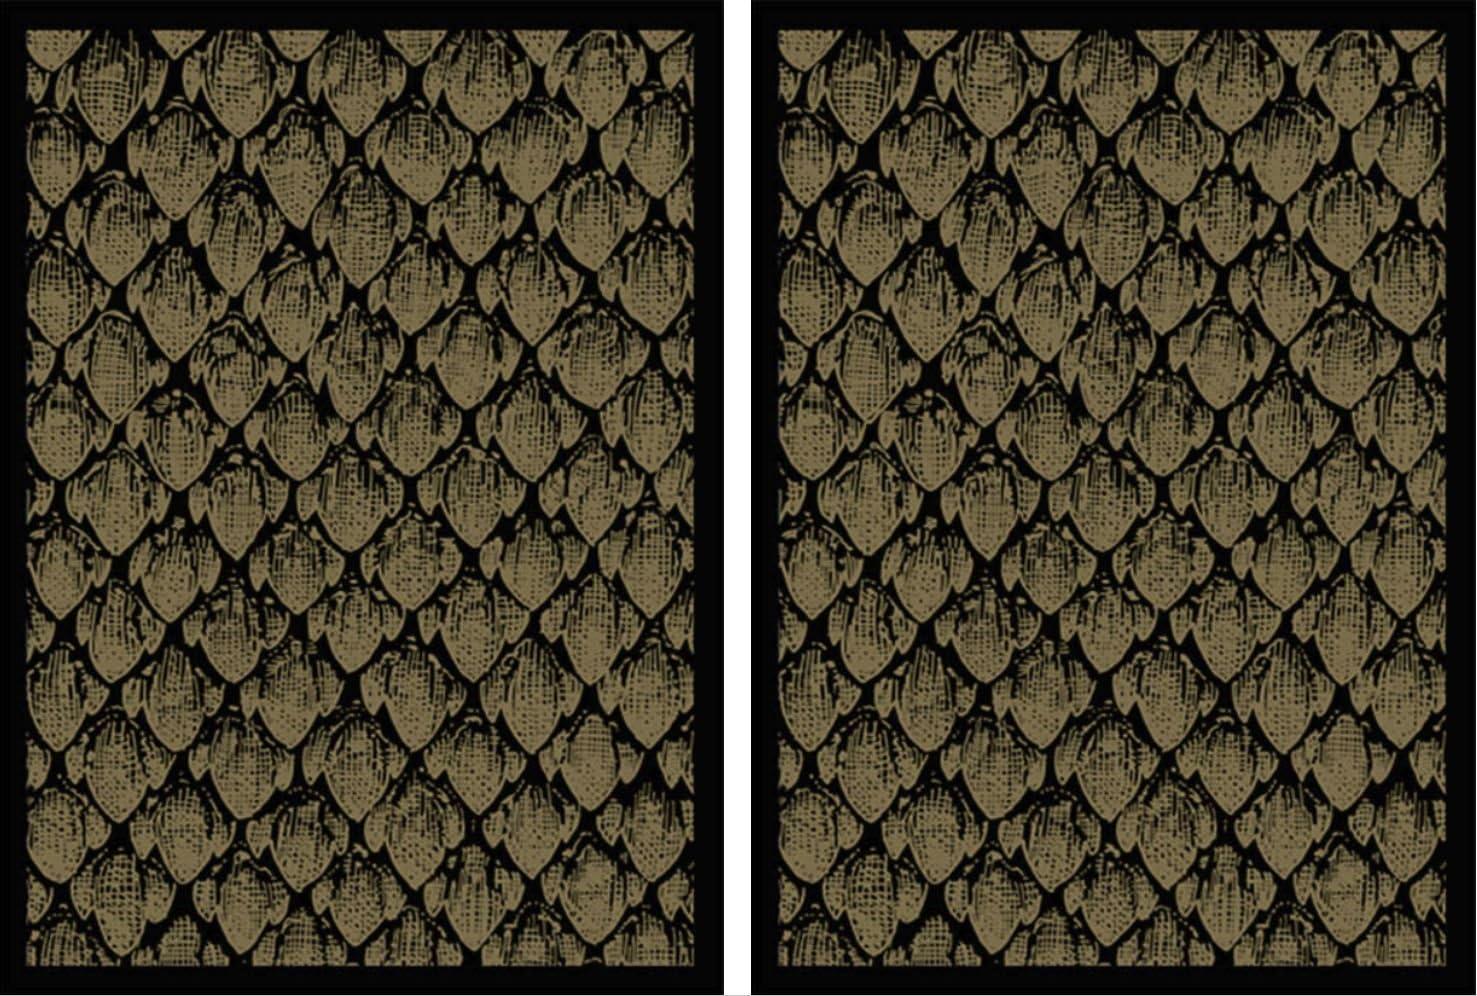 100 Legion Supplies Zen Garden Deck Protector Sleeves and Box